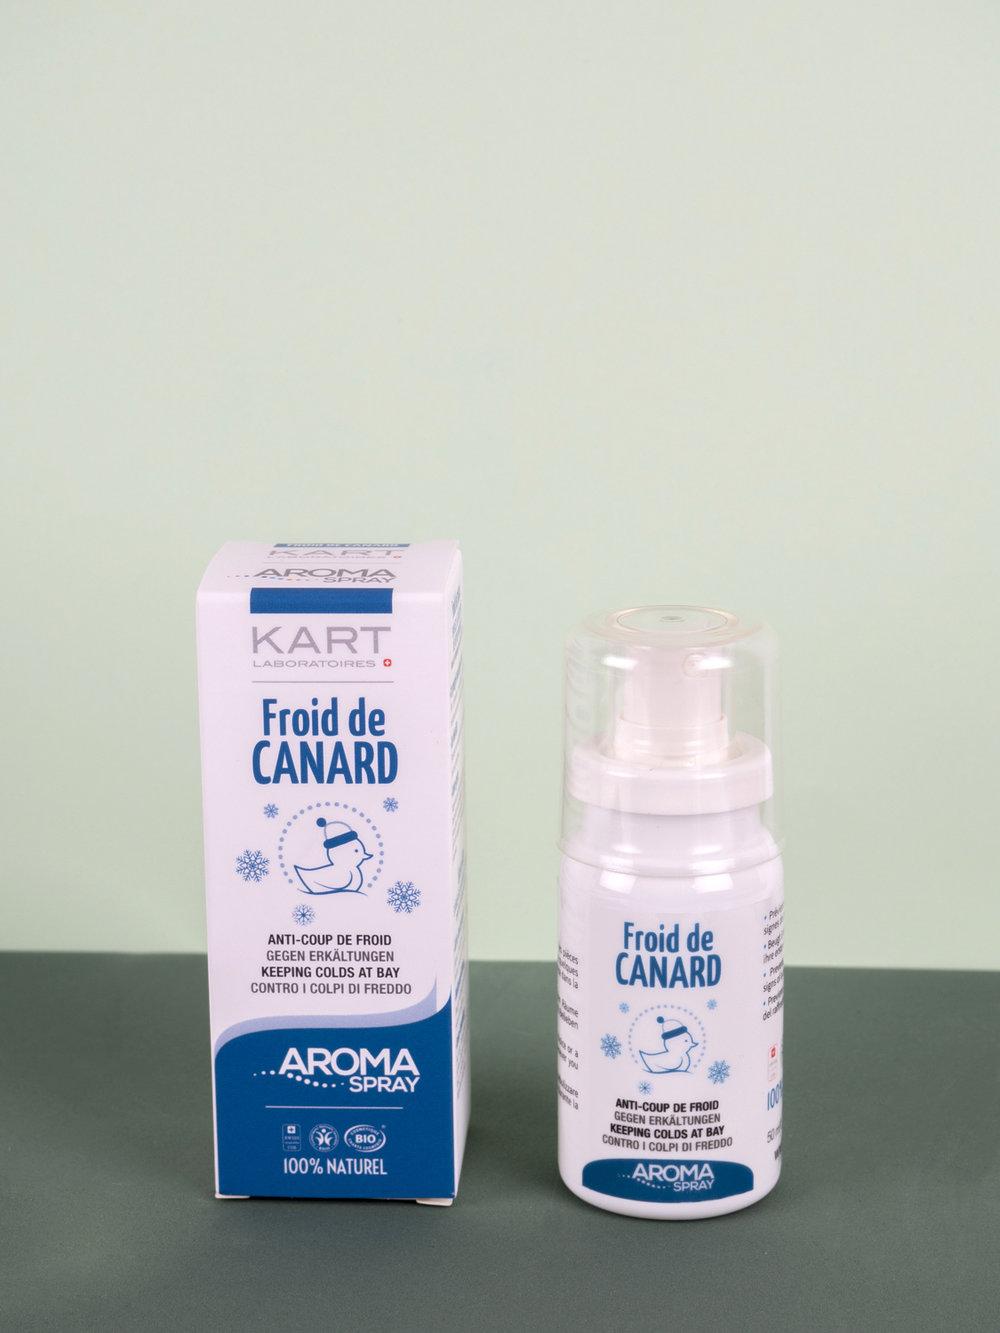 FROID DE CANARD